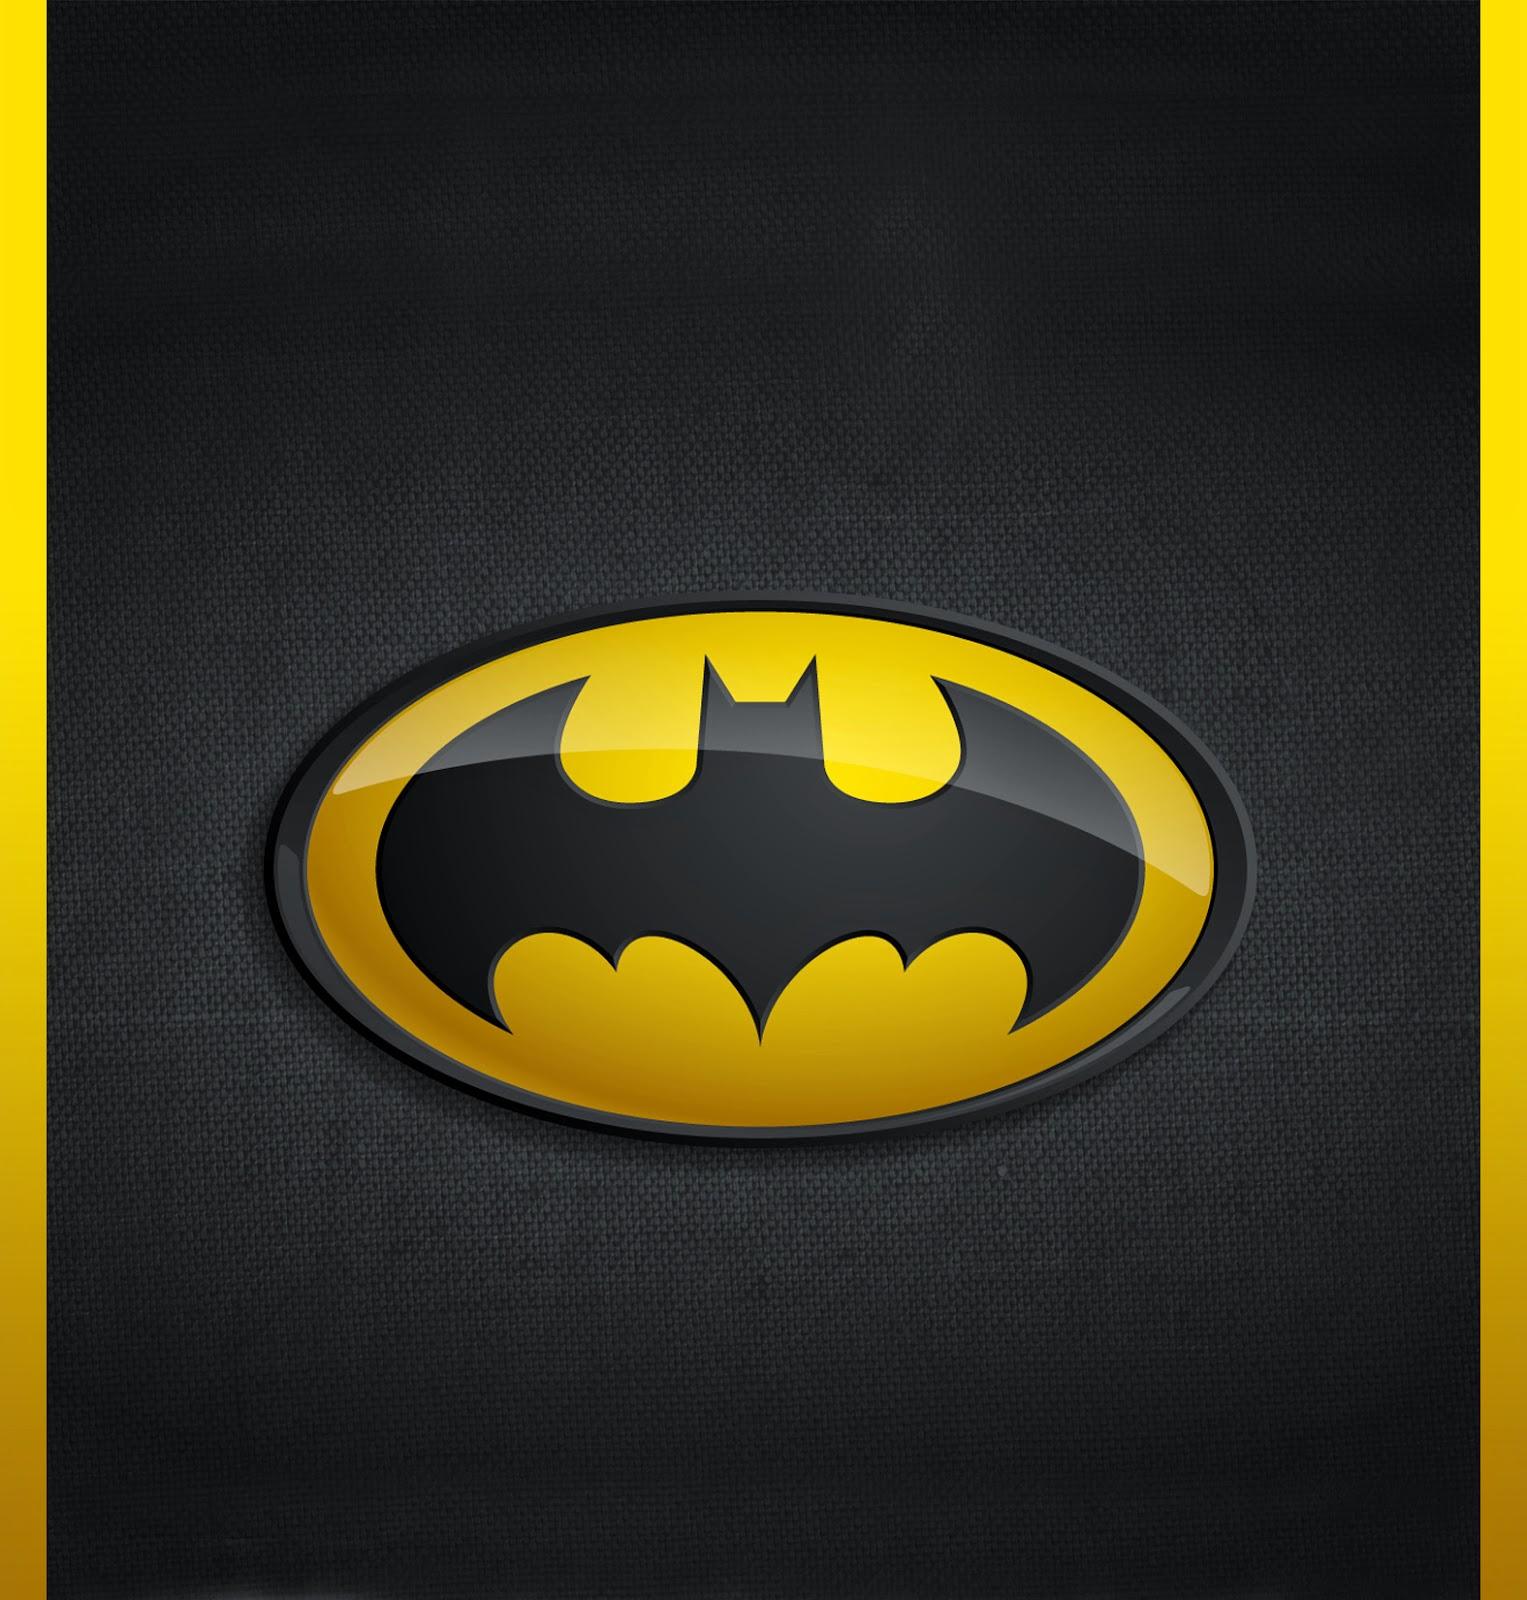 Batman Free Printable Chocolate Wrapper Oh My Fiesta